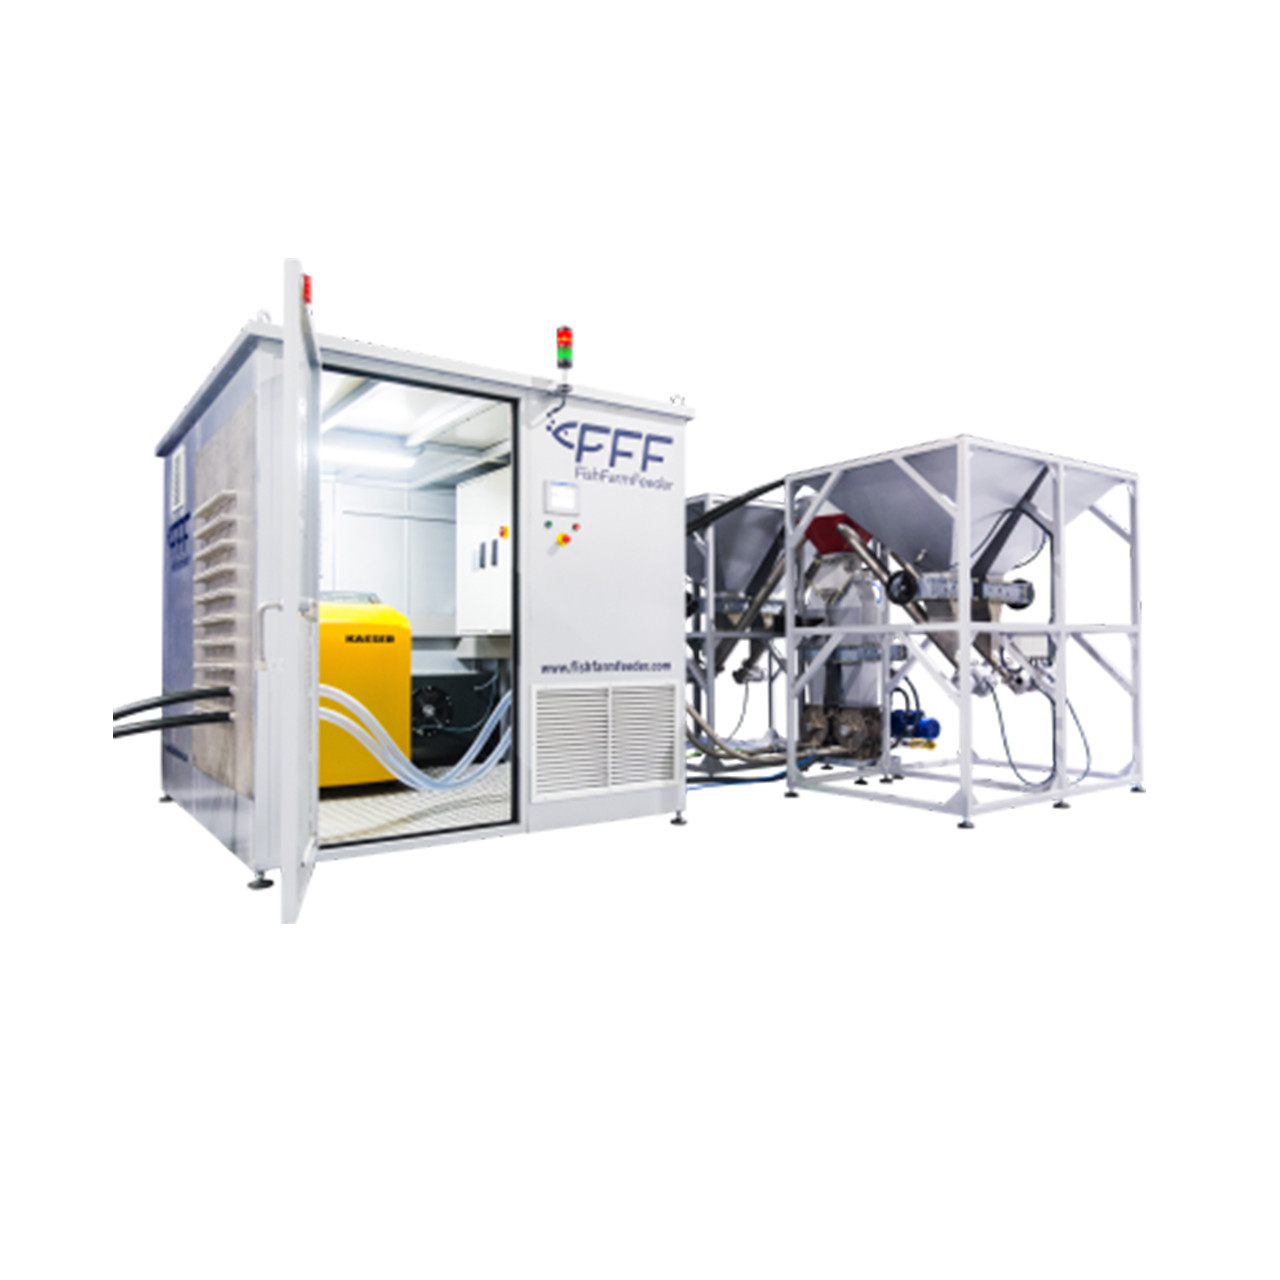 Alimentador centralizado para cultivo intensivo de camarón FFF